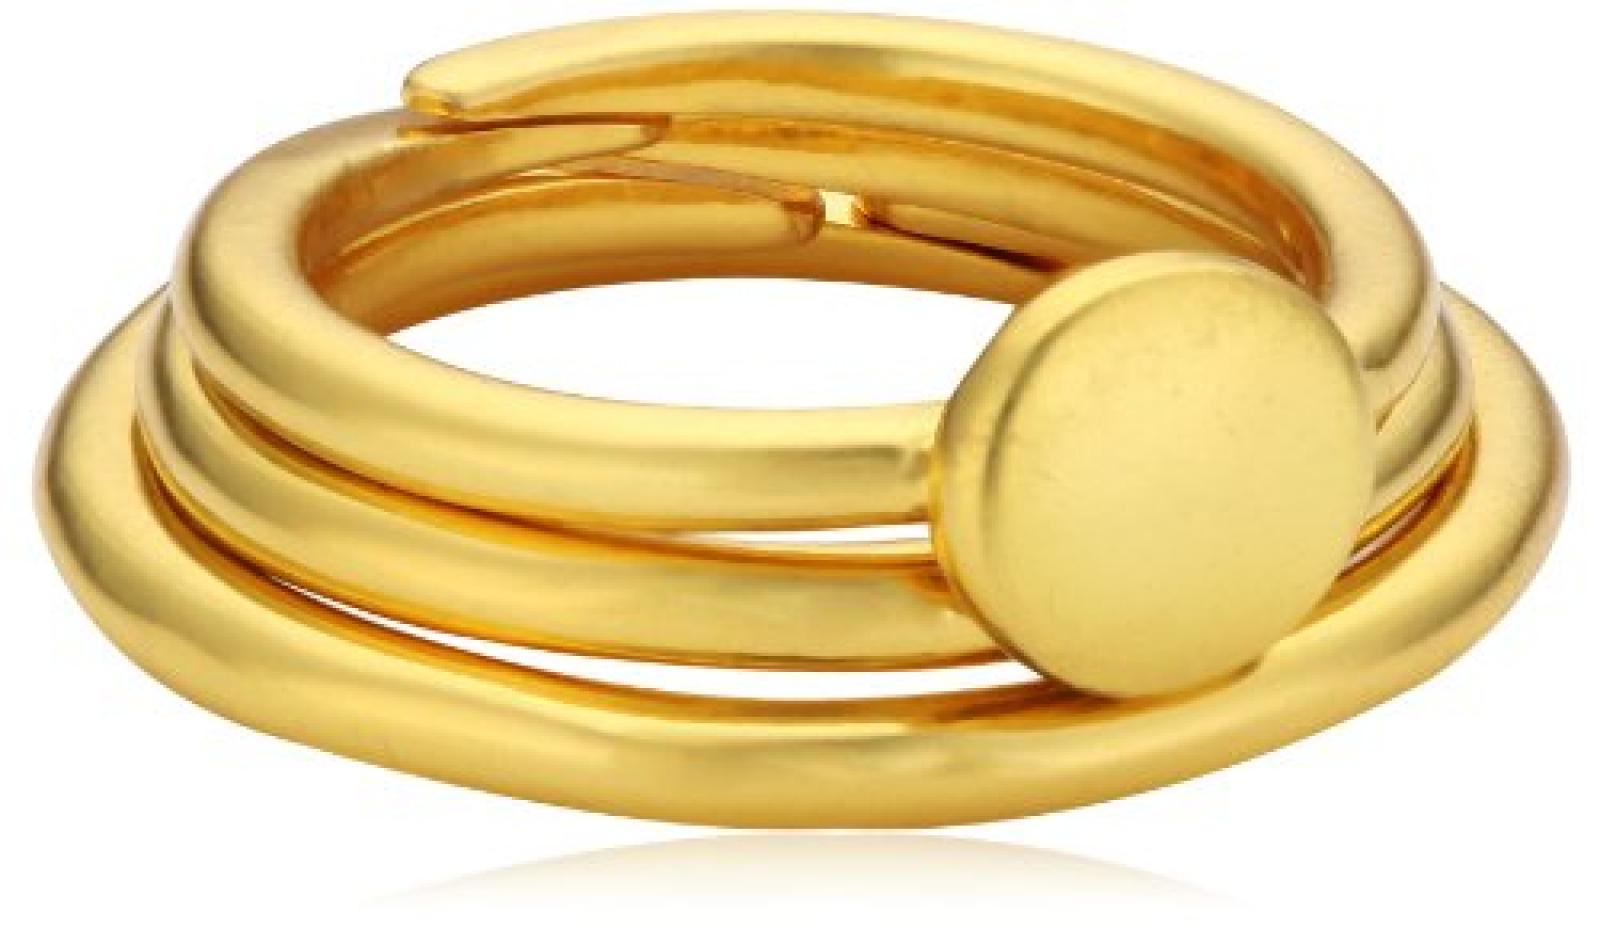 Pilgrim Jewelry Damen Ring Messing Stillness 0.6 cm 151422104